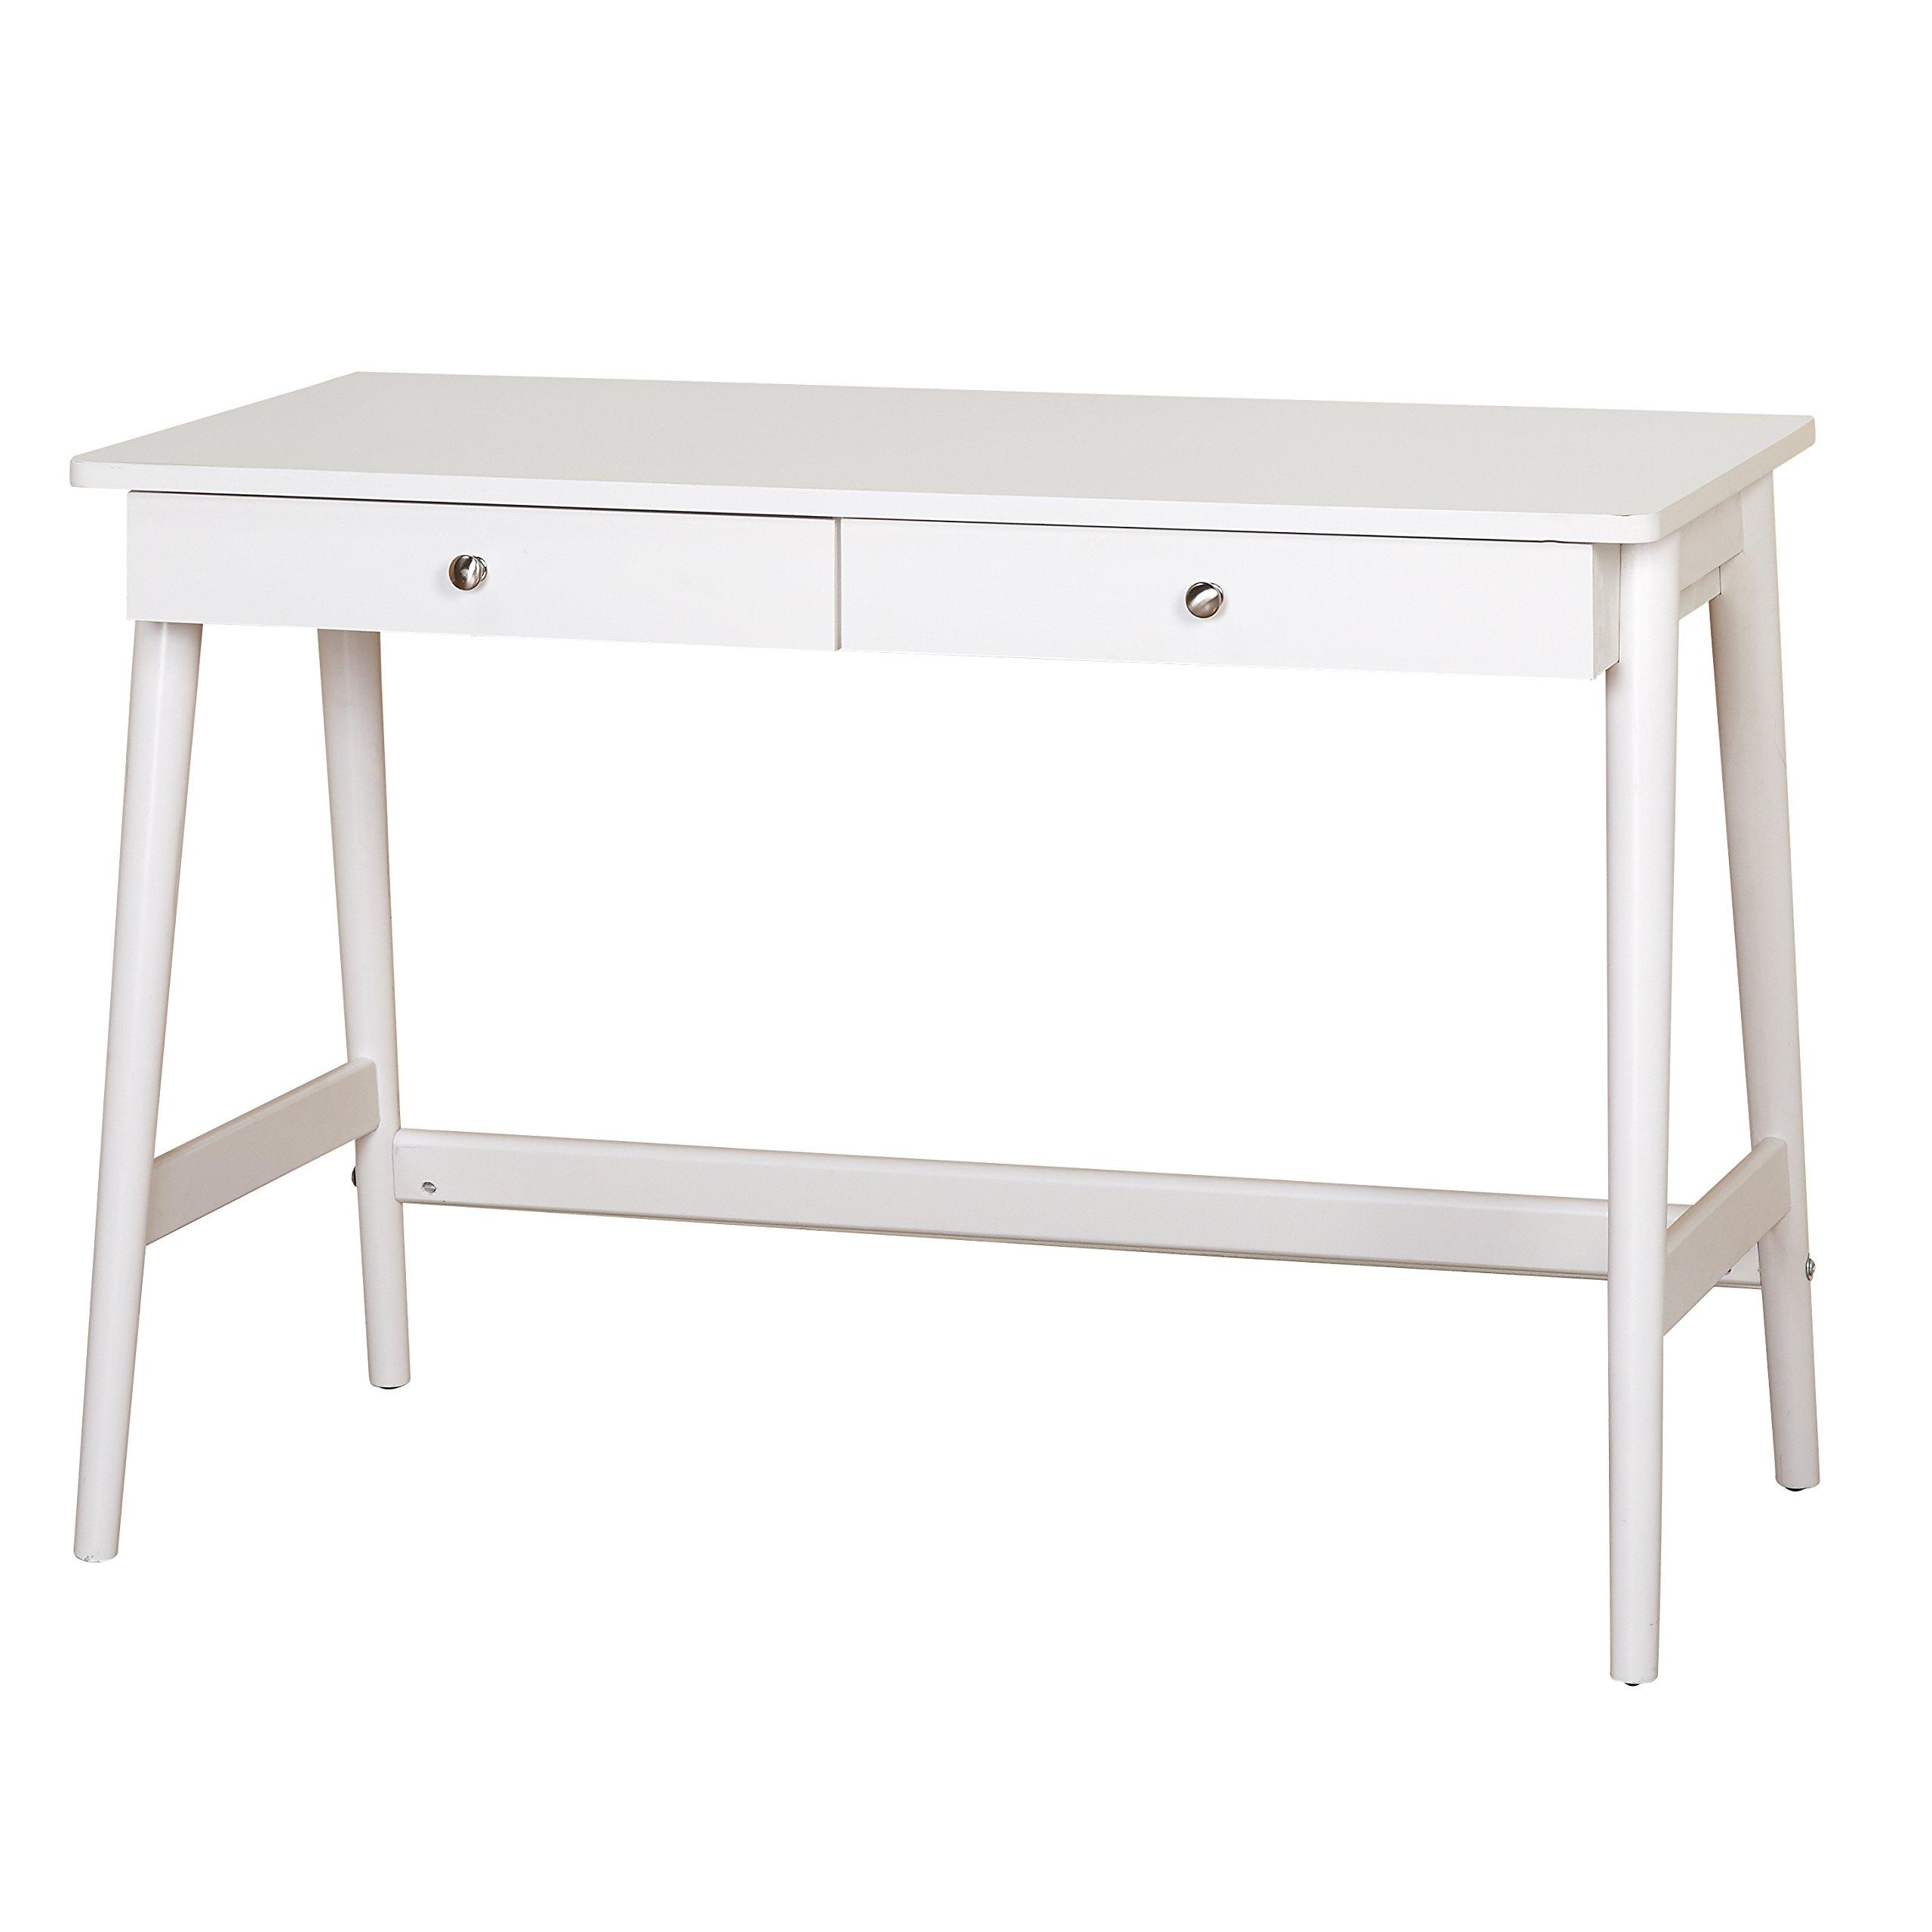 Target Marketing Systems 37707WHT Vera White Wood Desk by Target Marketing Systems